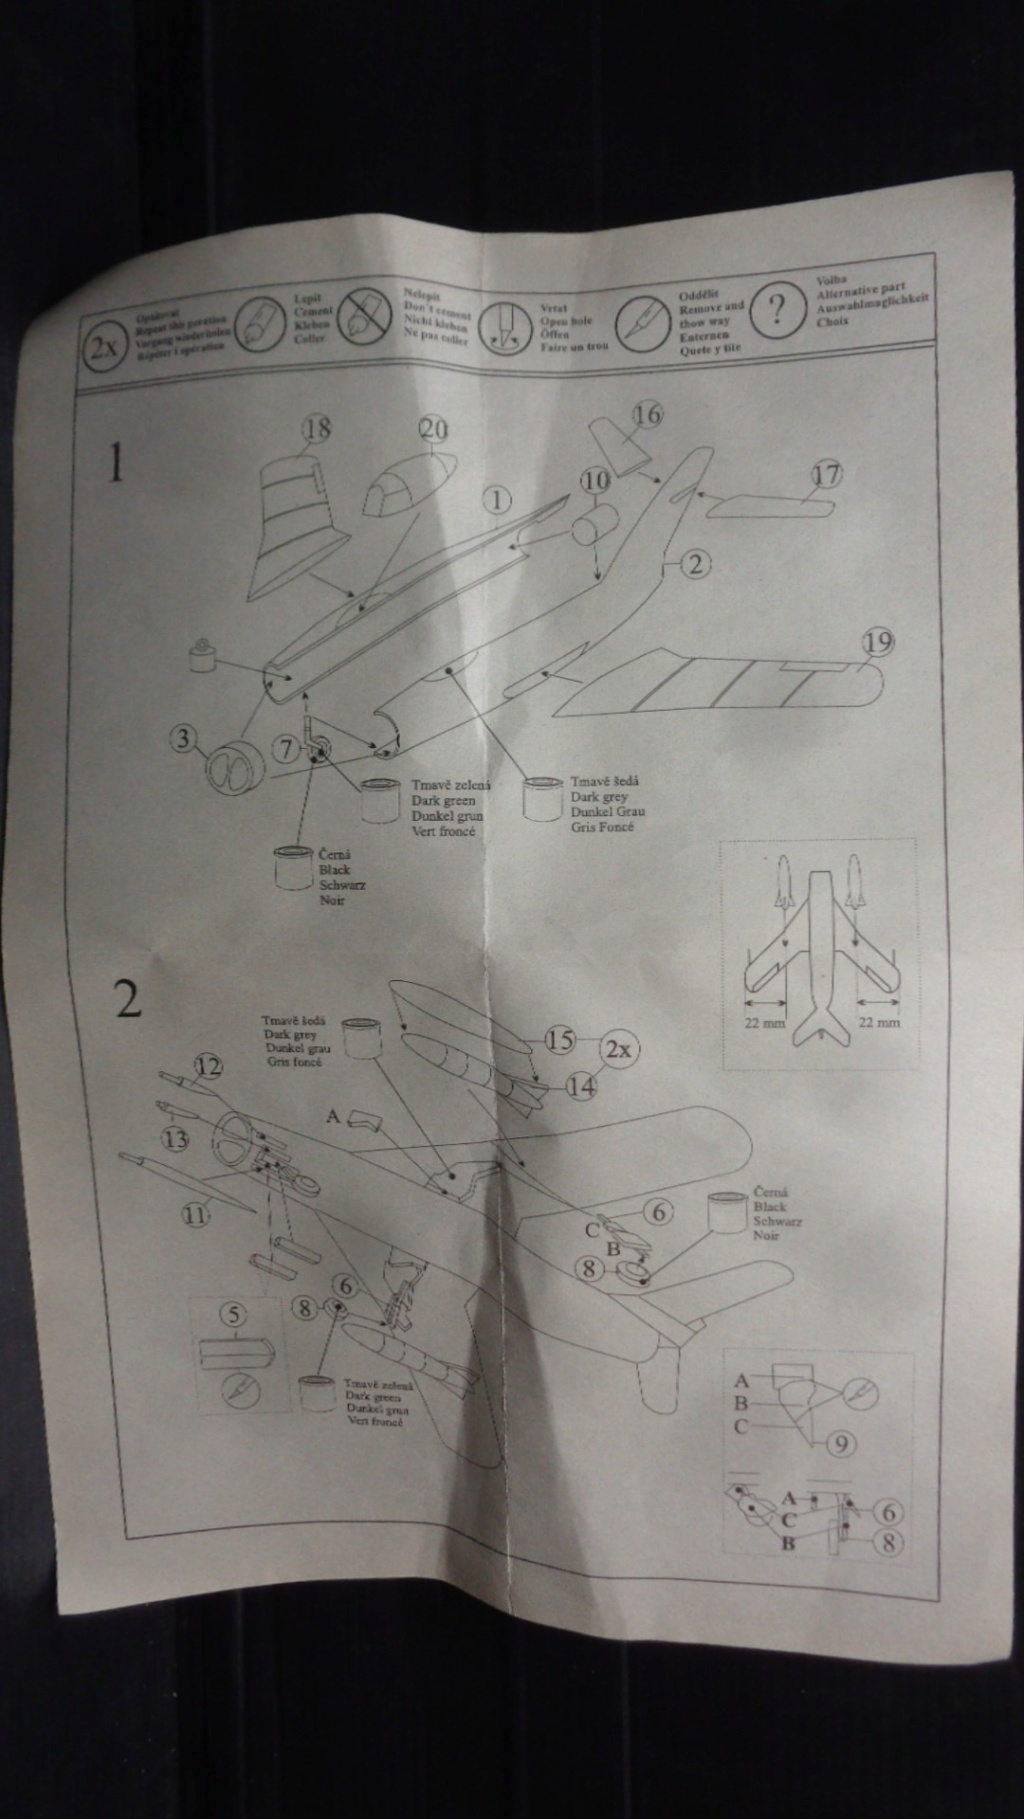 MIG 17 F  Attack Hobby Kits (Jach) 1/144 Dsc07548